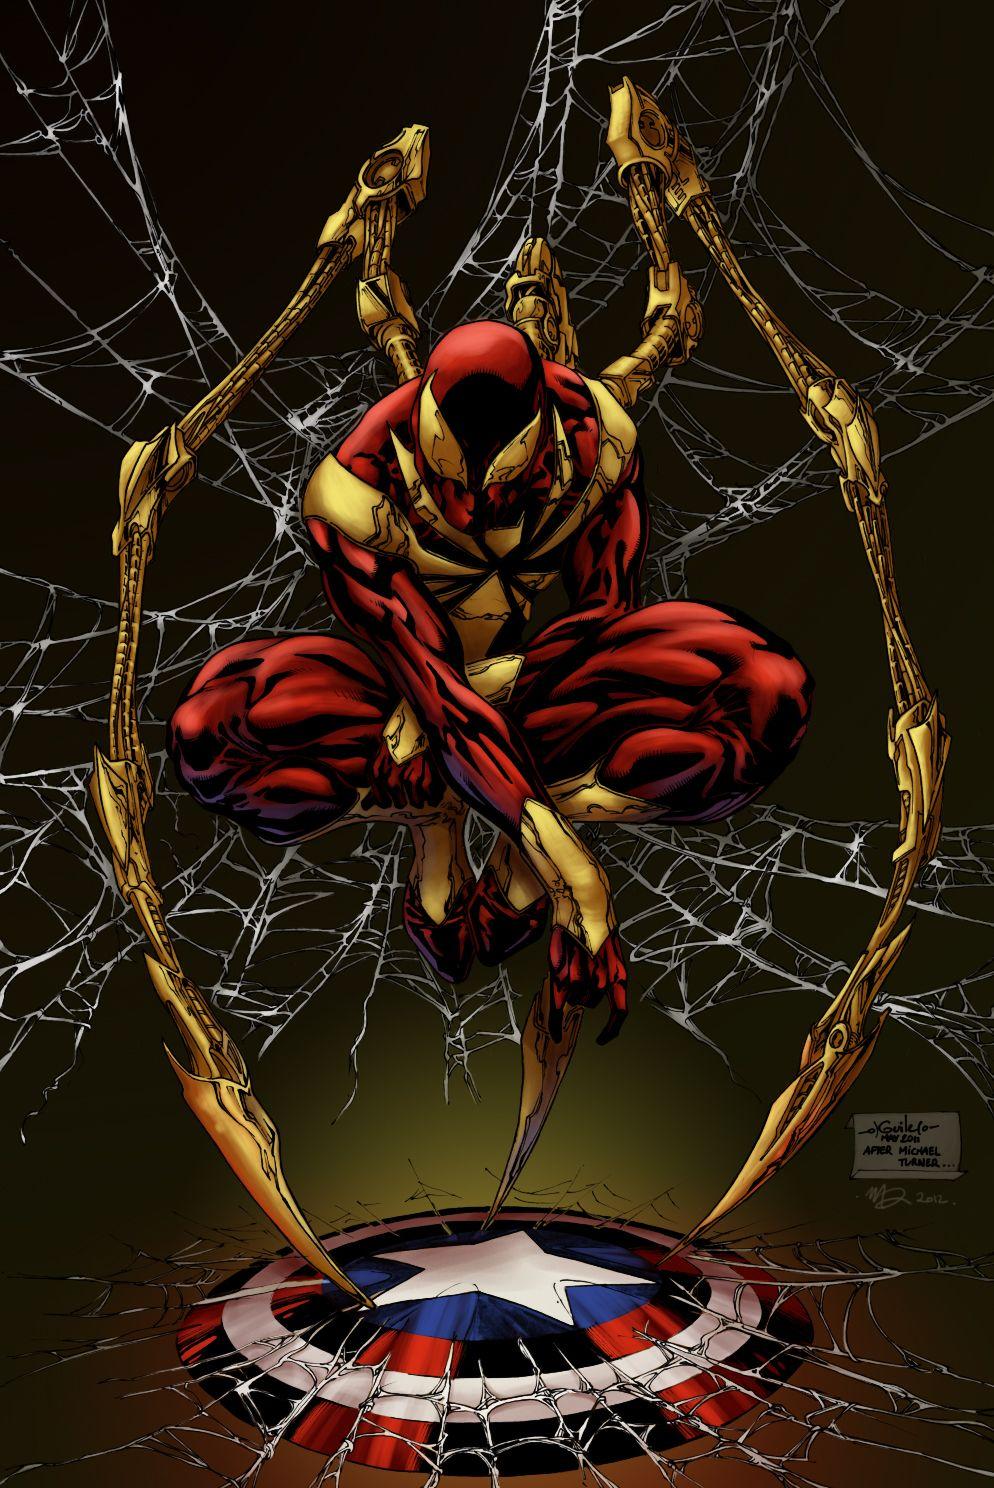 Iron SpiderMan Misda colors by SpiderGuile.deviantart